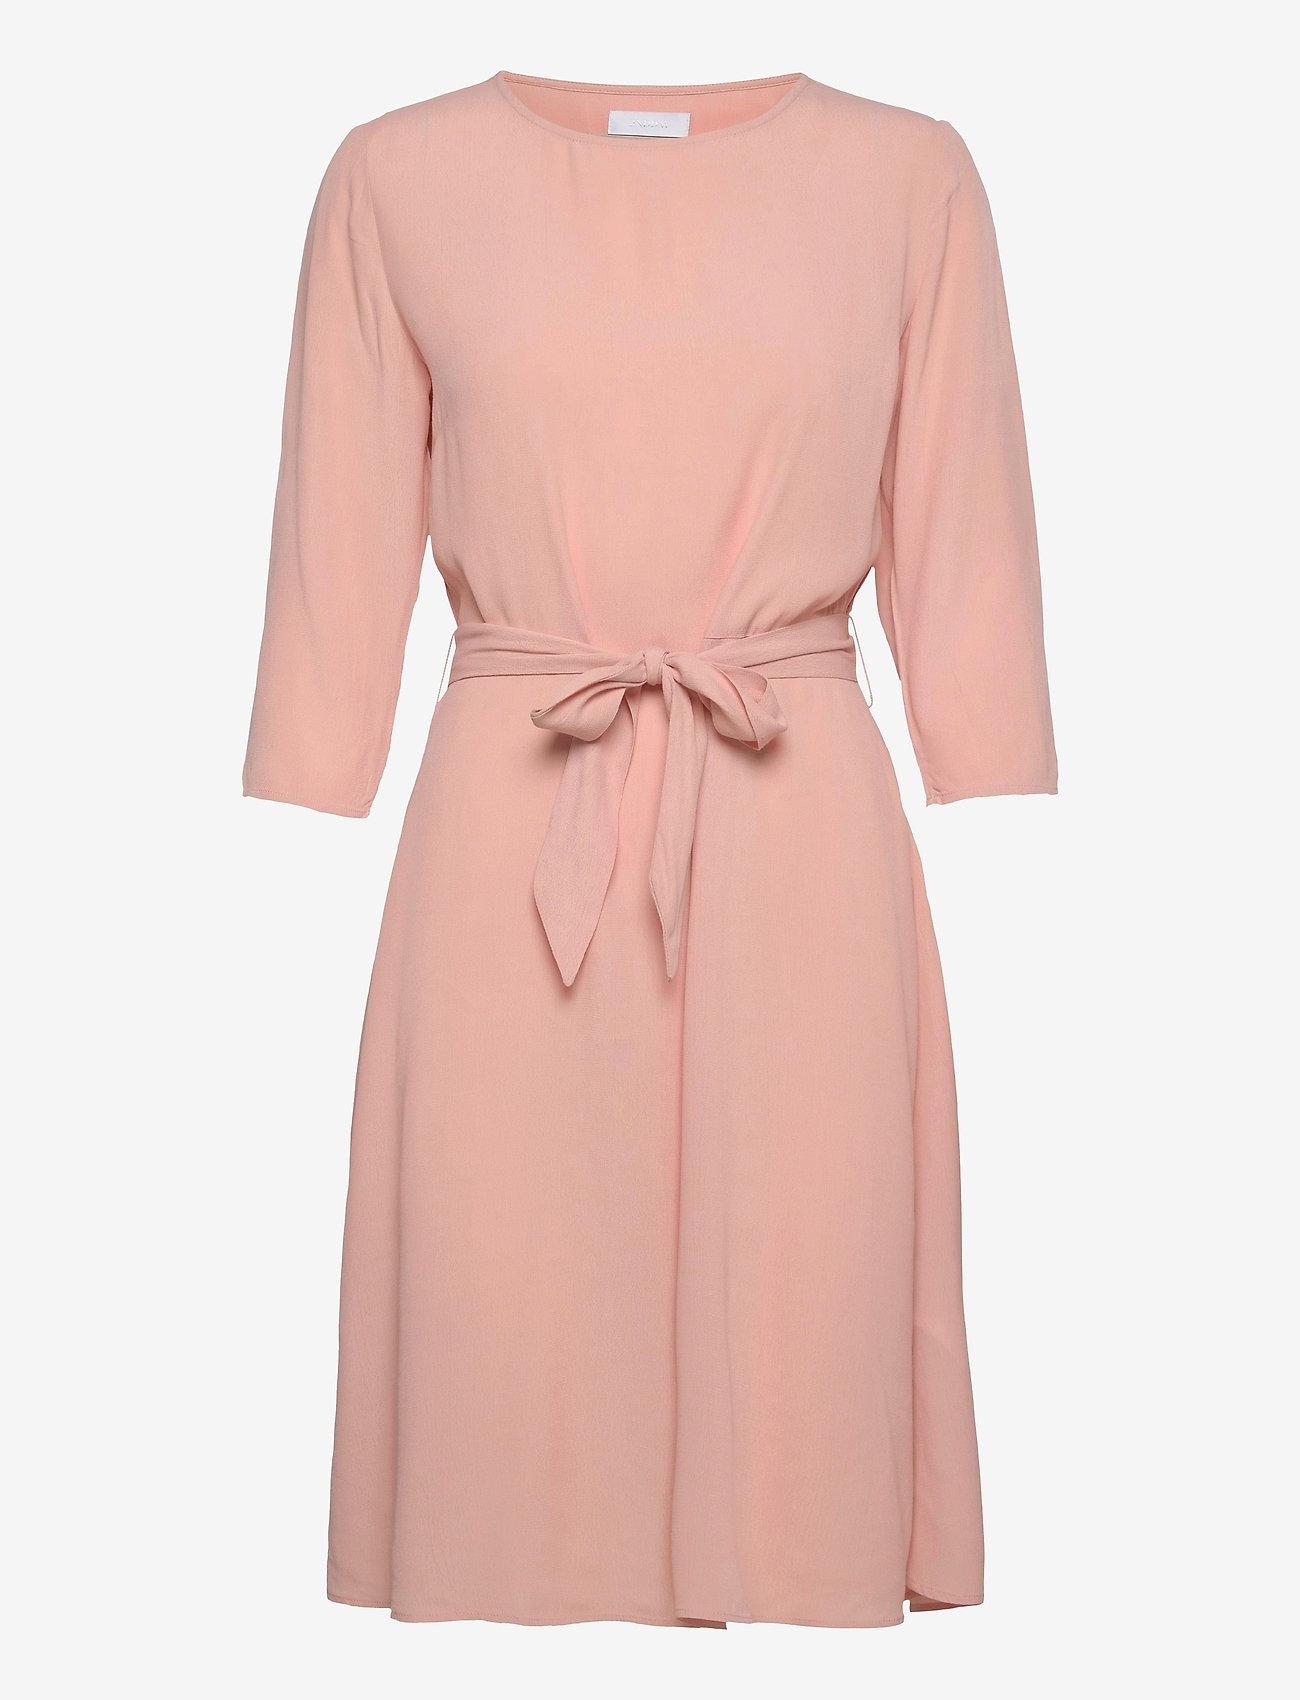 2NDDAY - 2ND June ThinkTwice - everyday dresses - misty rose - 0